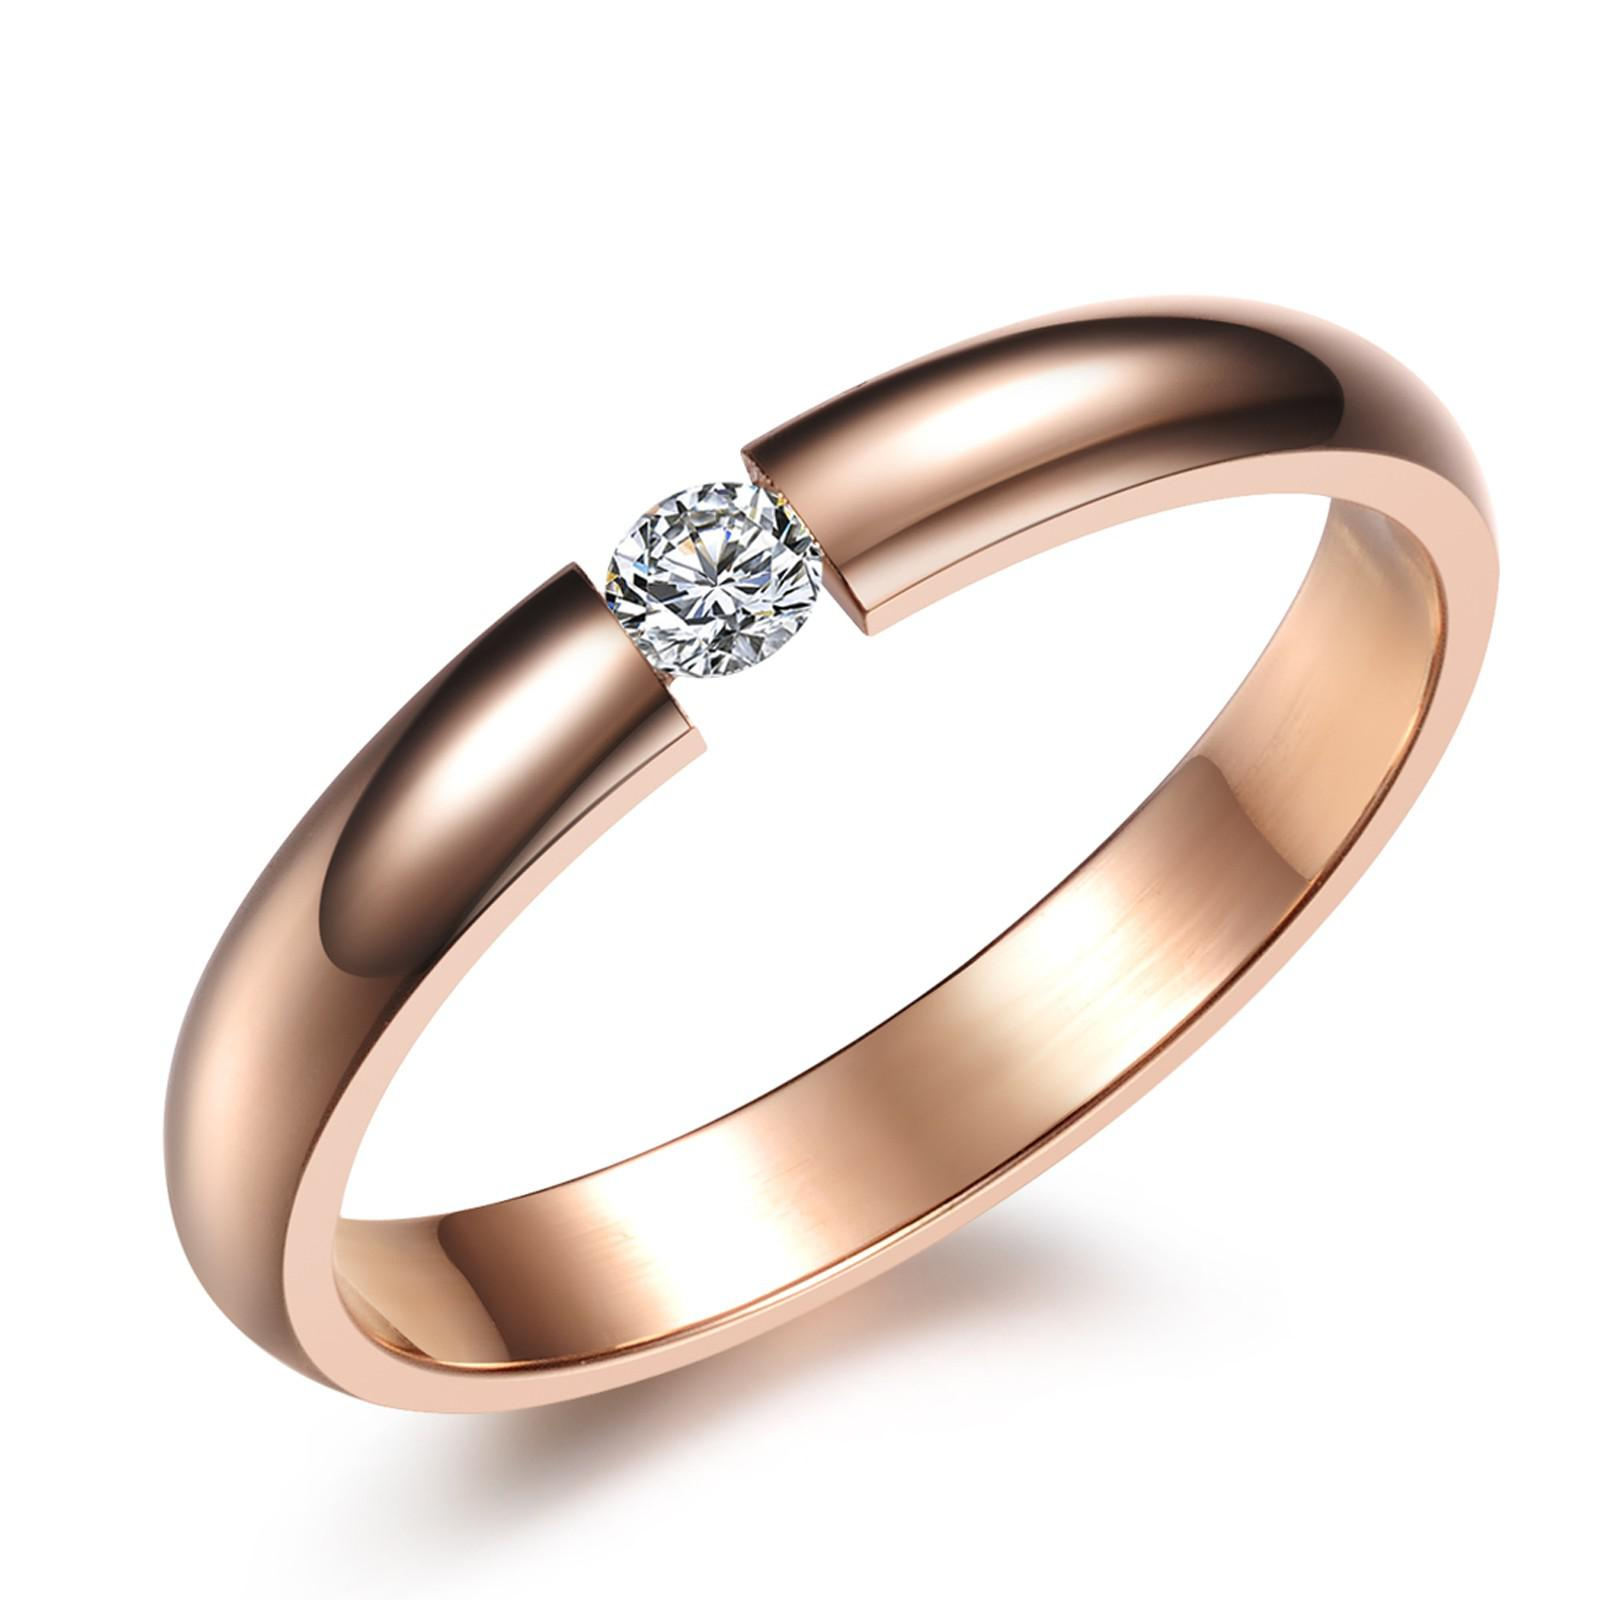 delicate gold wedding rings delicate wedding bands Delicate gold wedding rings